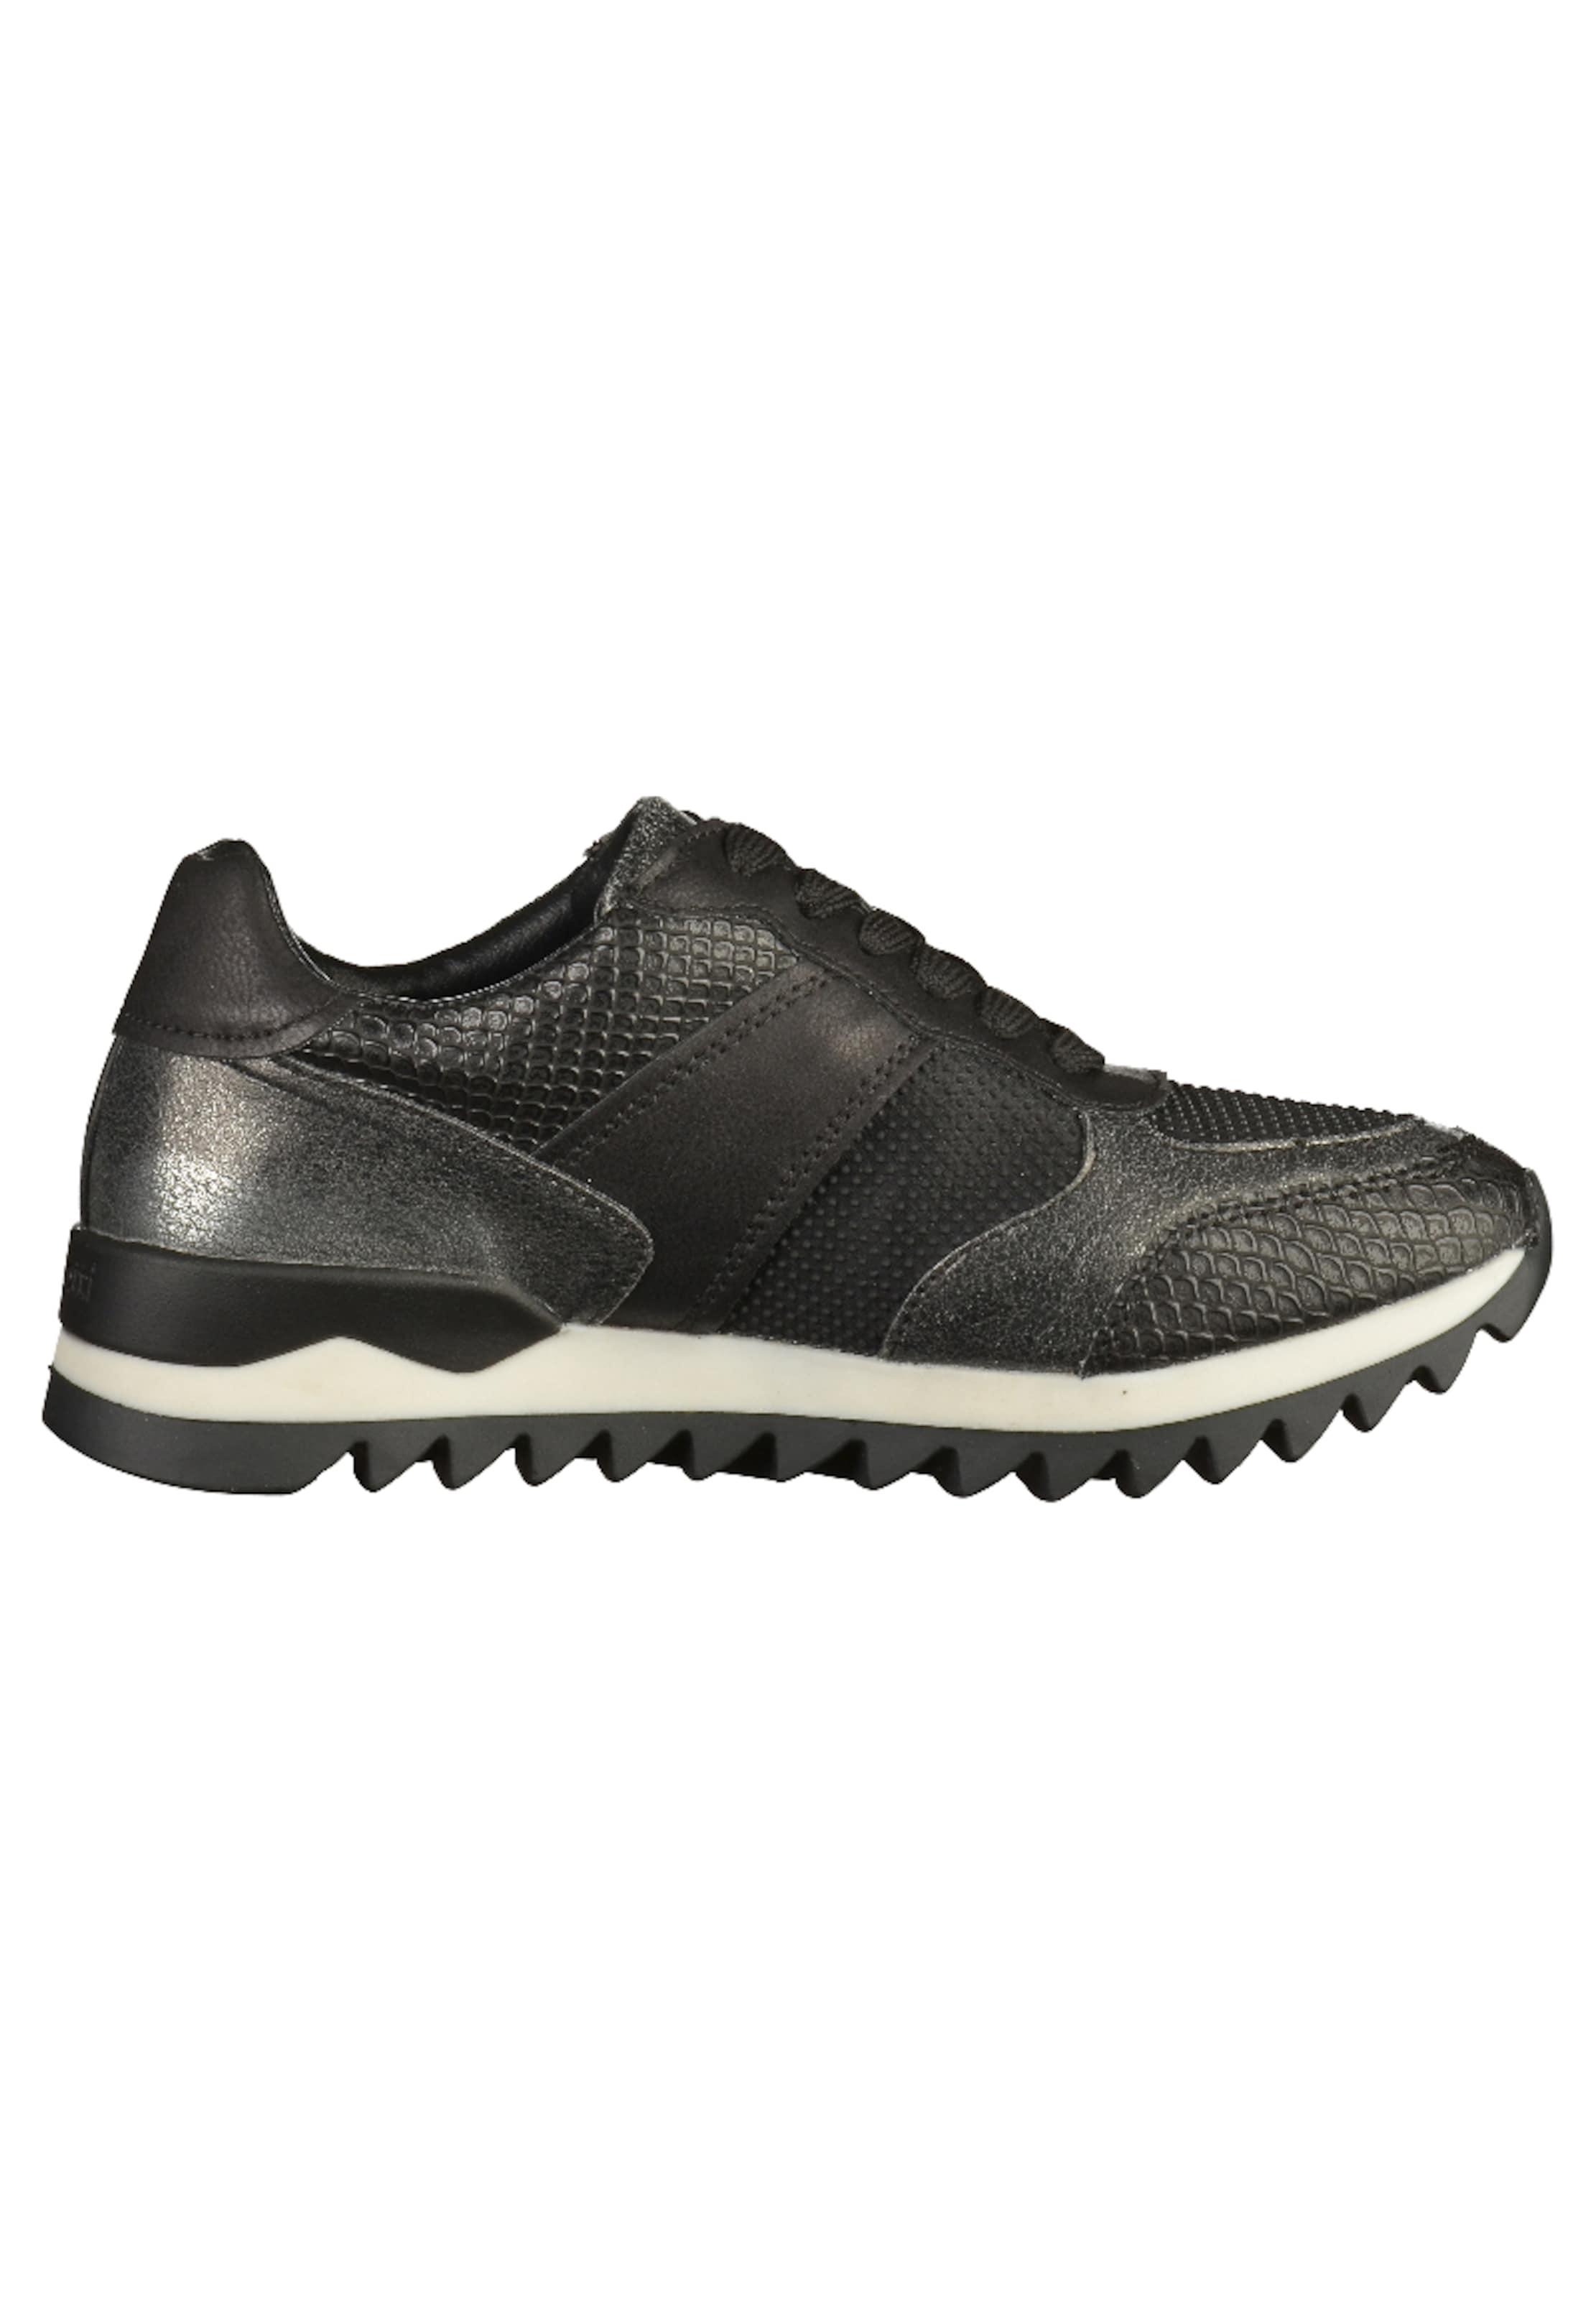 Sneaker bugatti bugatti bugatti bugatti Sneaker Sneaker bugatti bugatti Sneaker Sneaker xpq1Y6w76